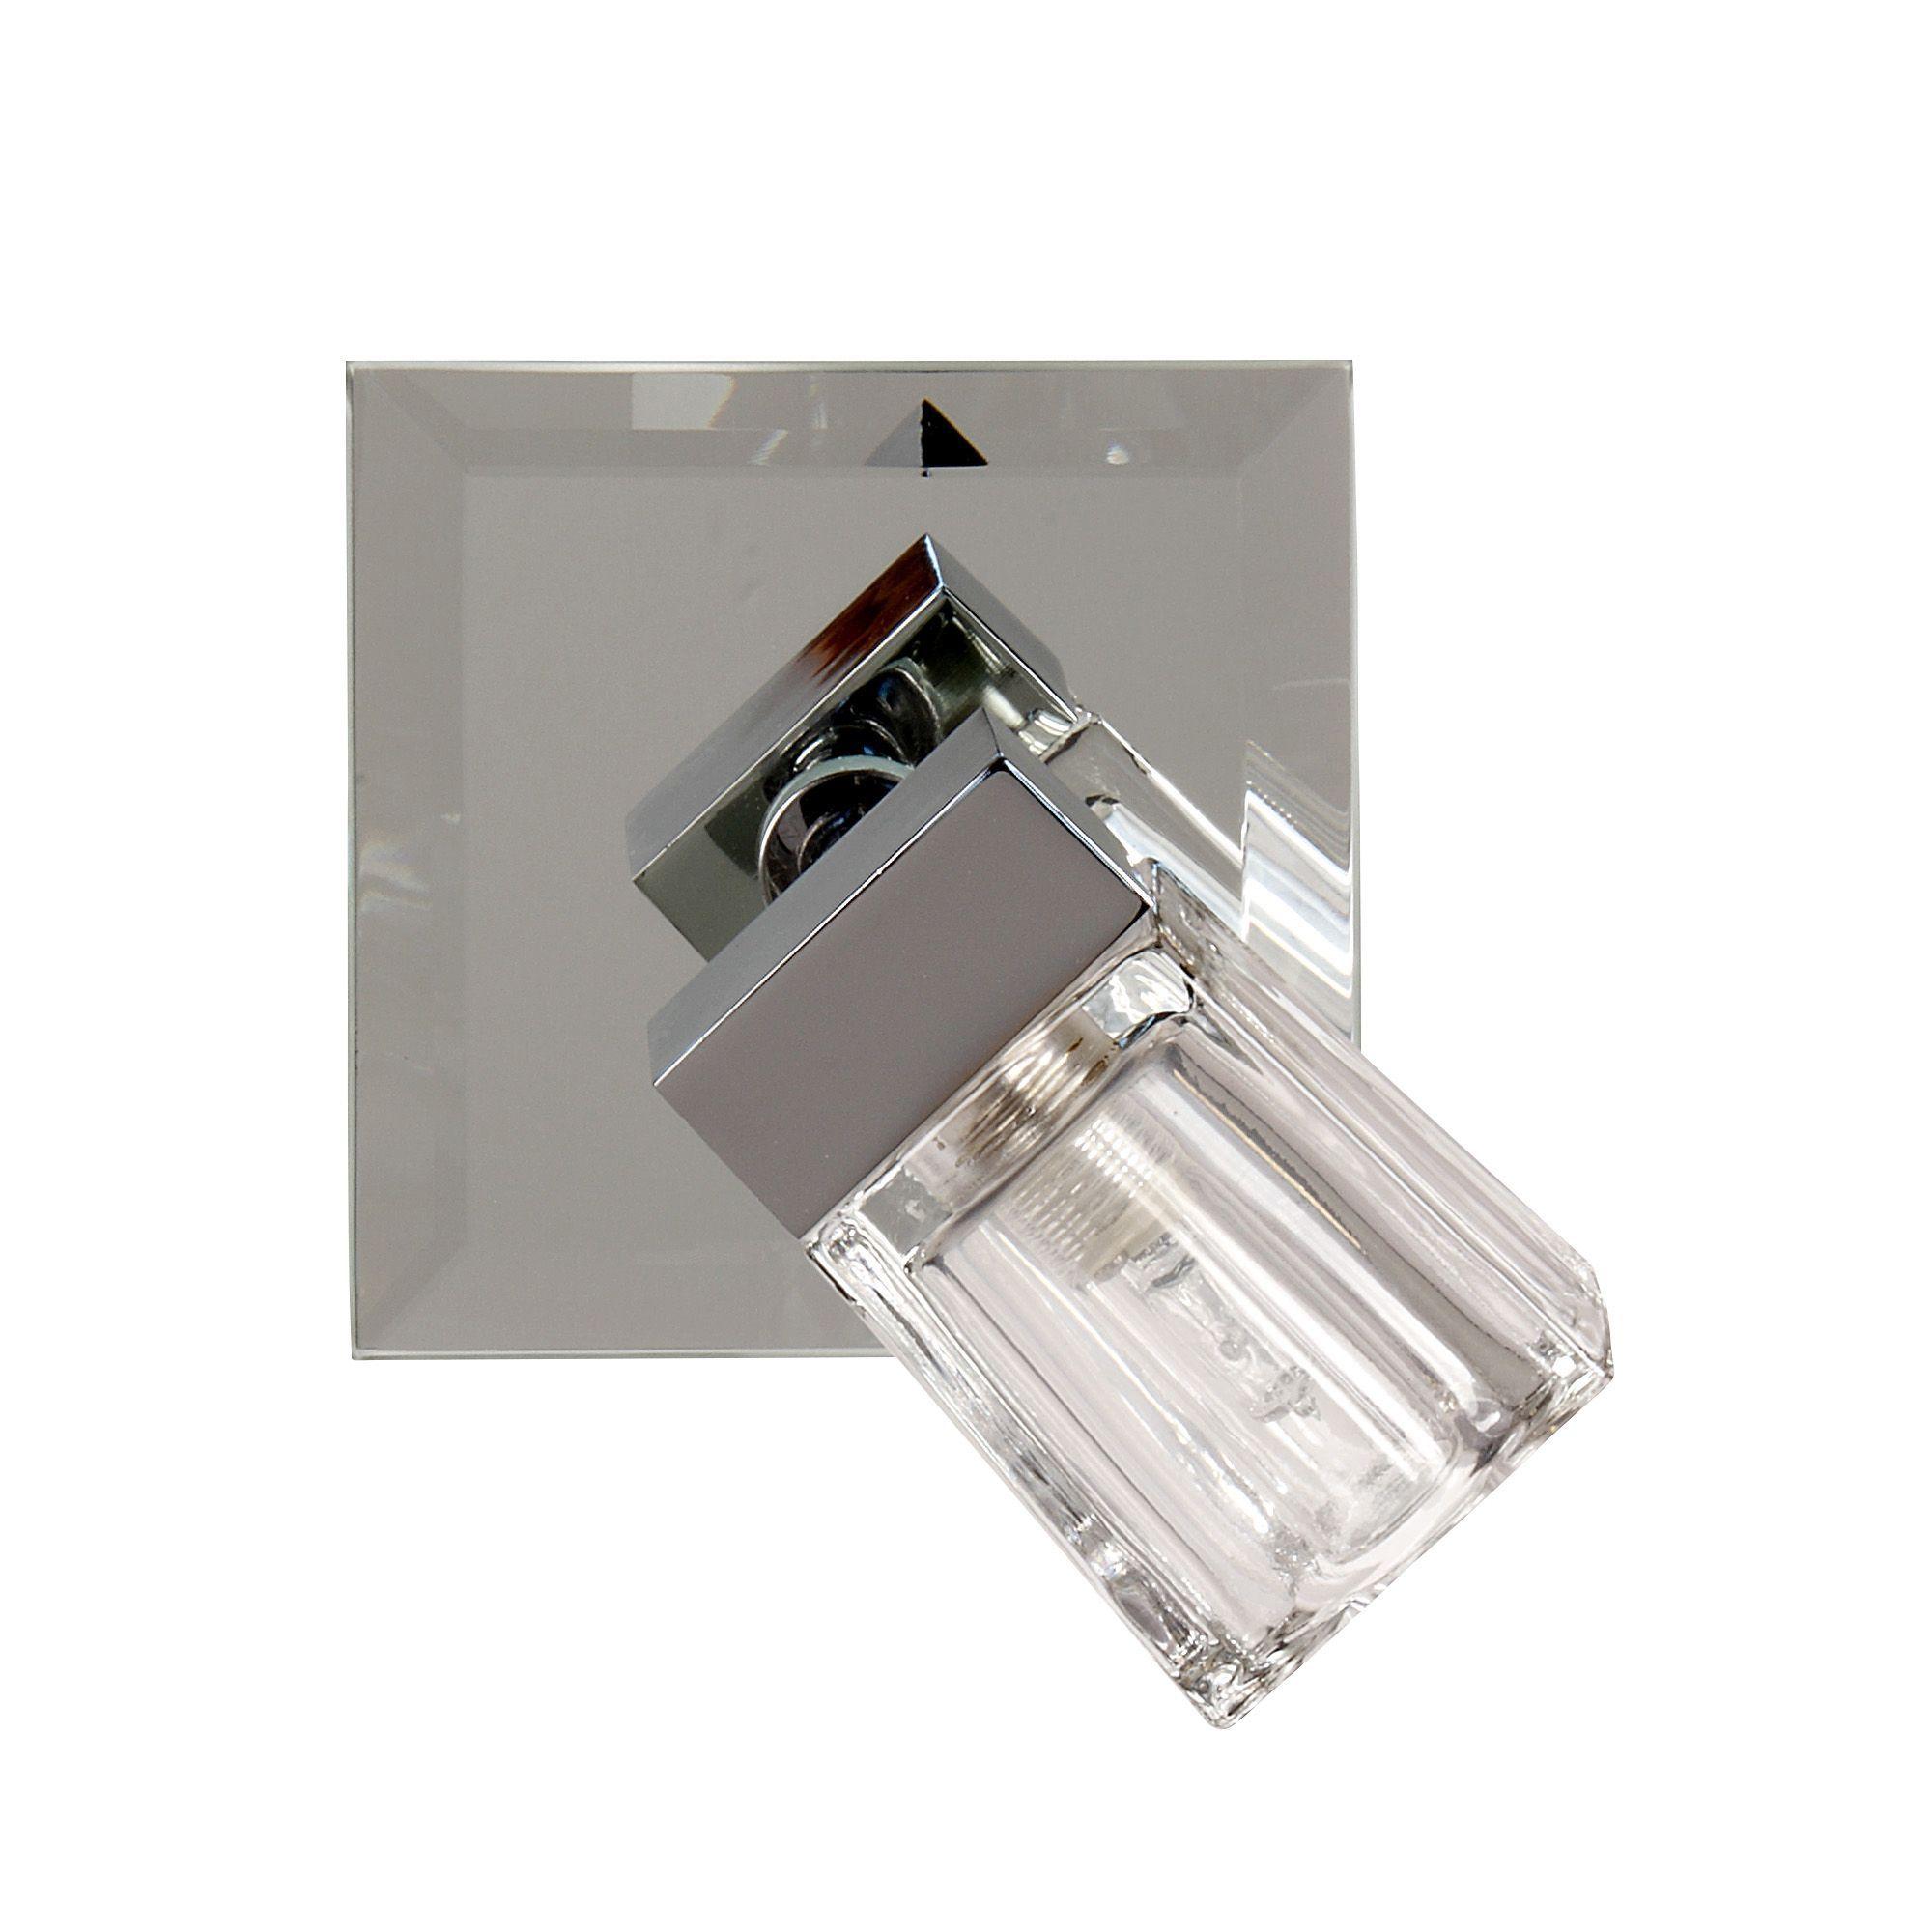 spot orientable 1 lumi re de salle de bain chrome verre. Black Bedroom Furniture Sets. Home Design Ideas